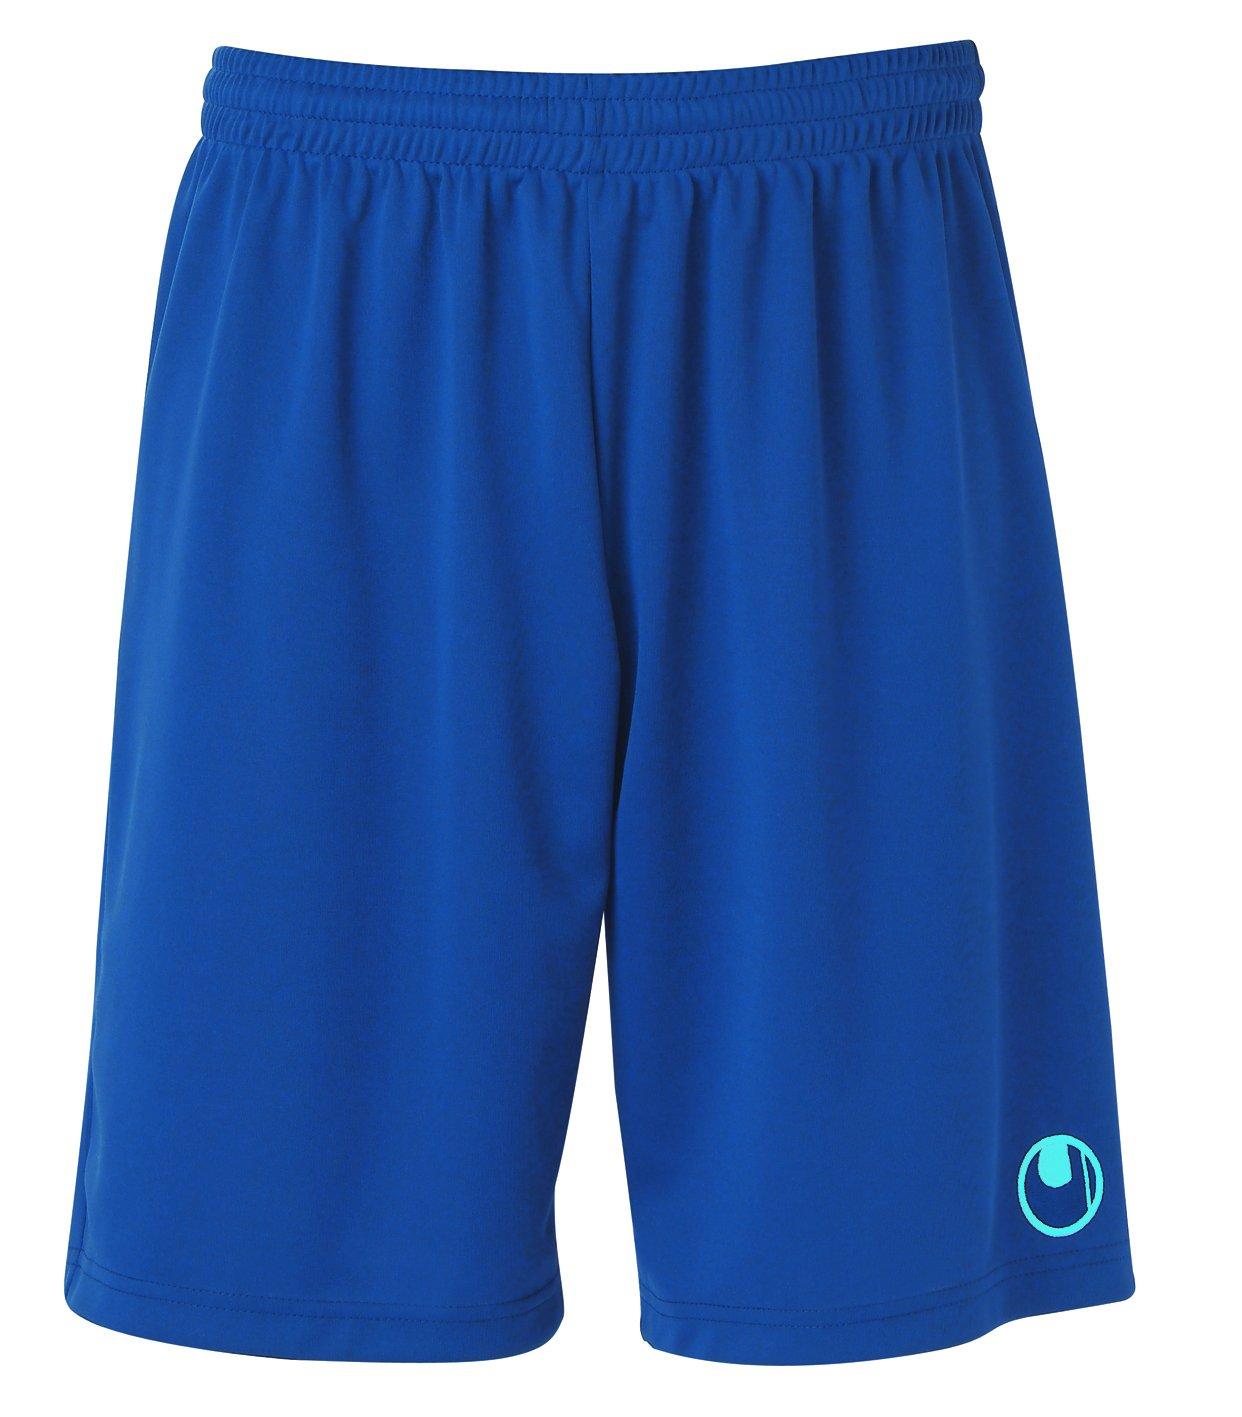 uhlsport Hombre Center II Interior Slip Pantalones Cortos